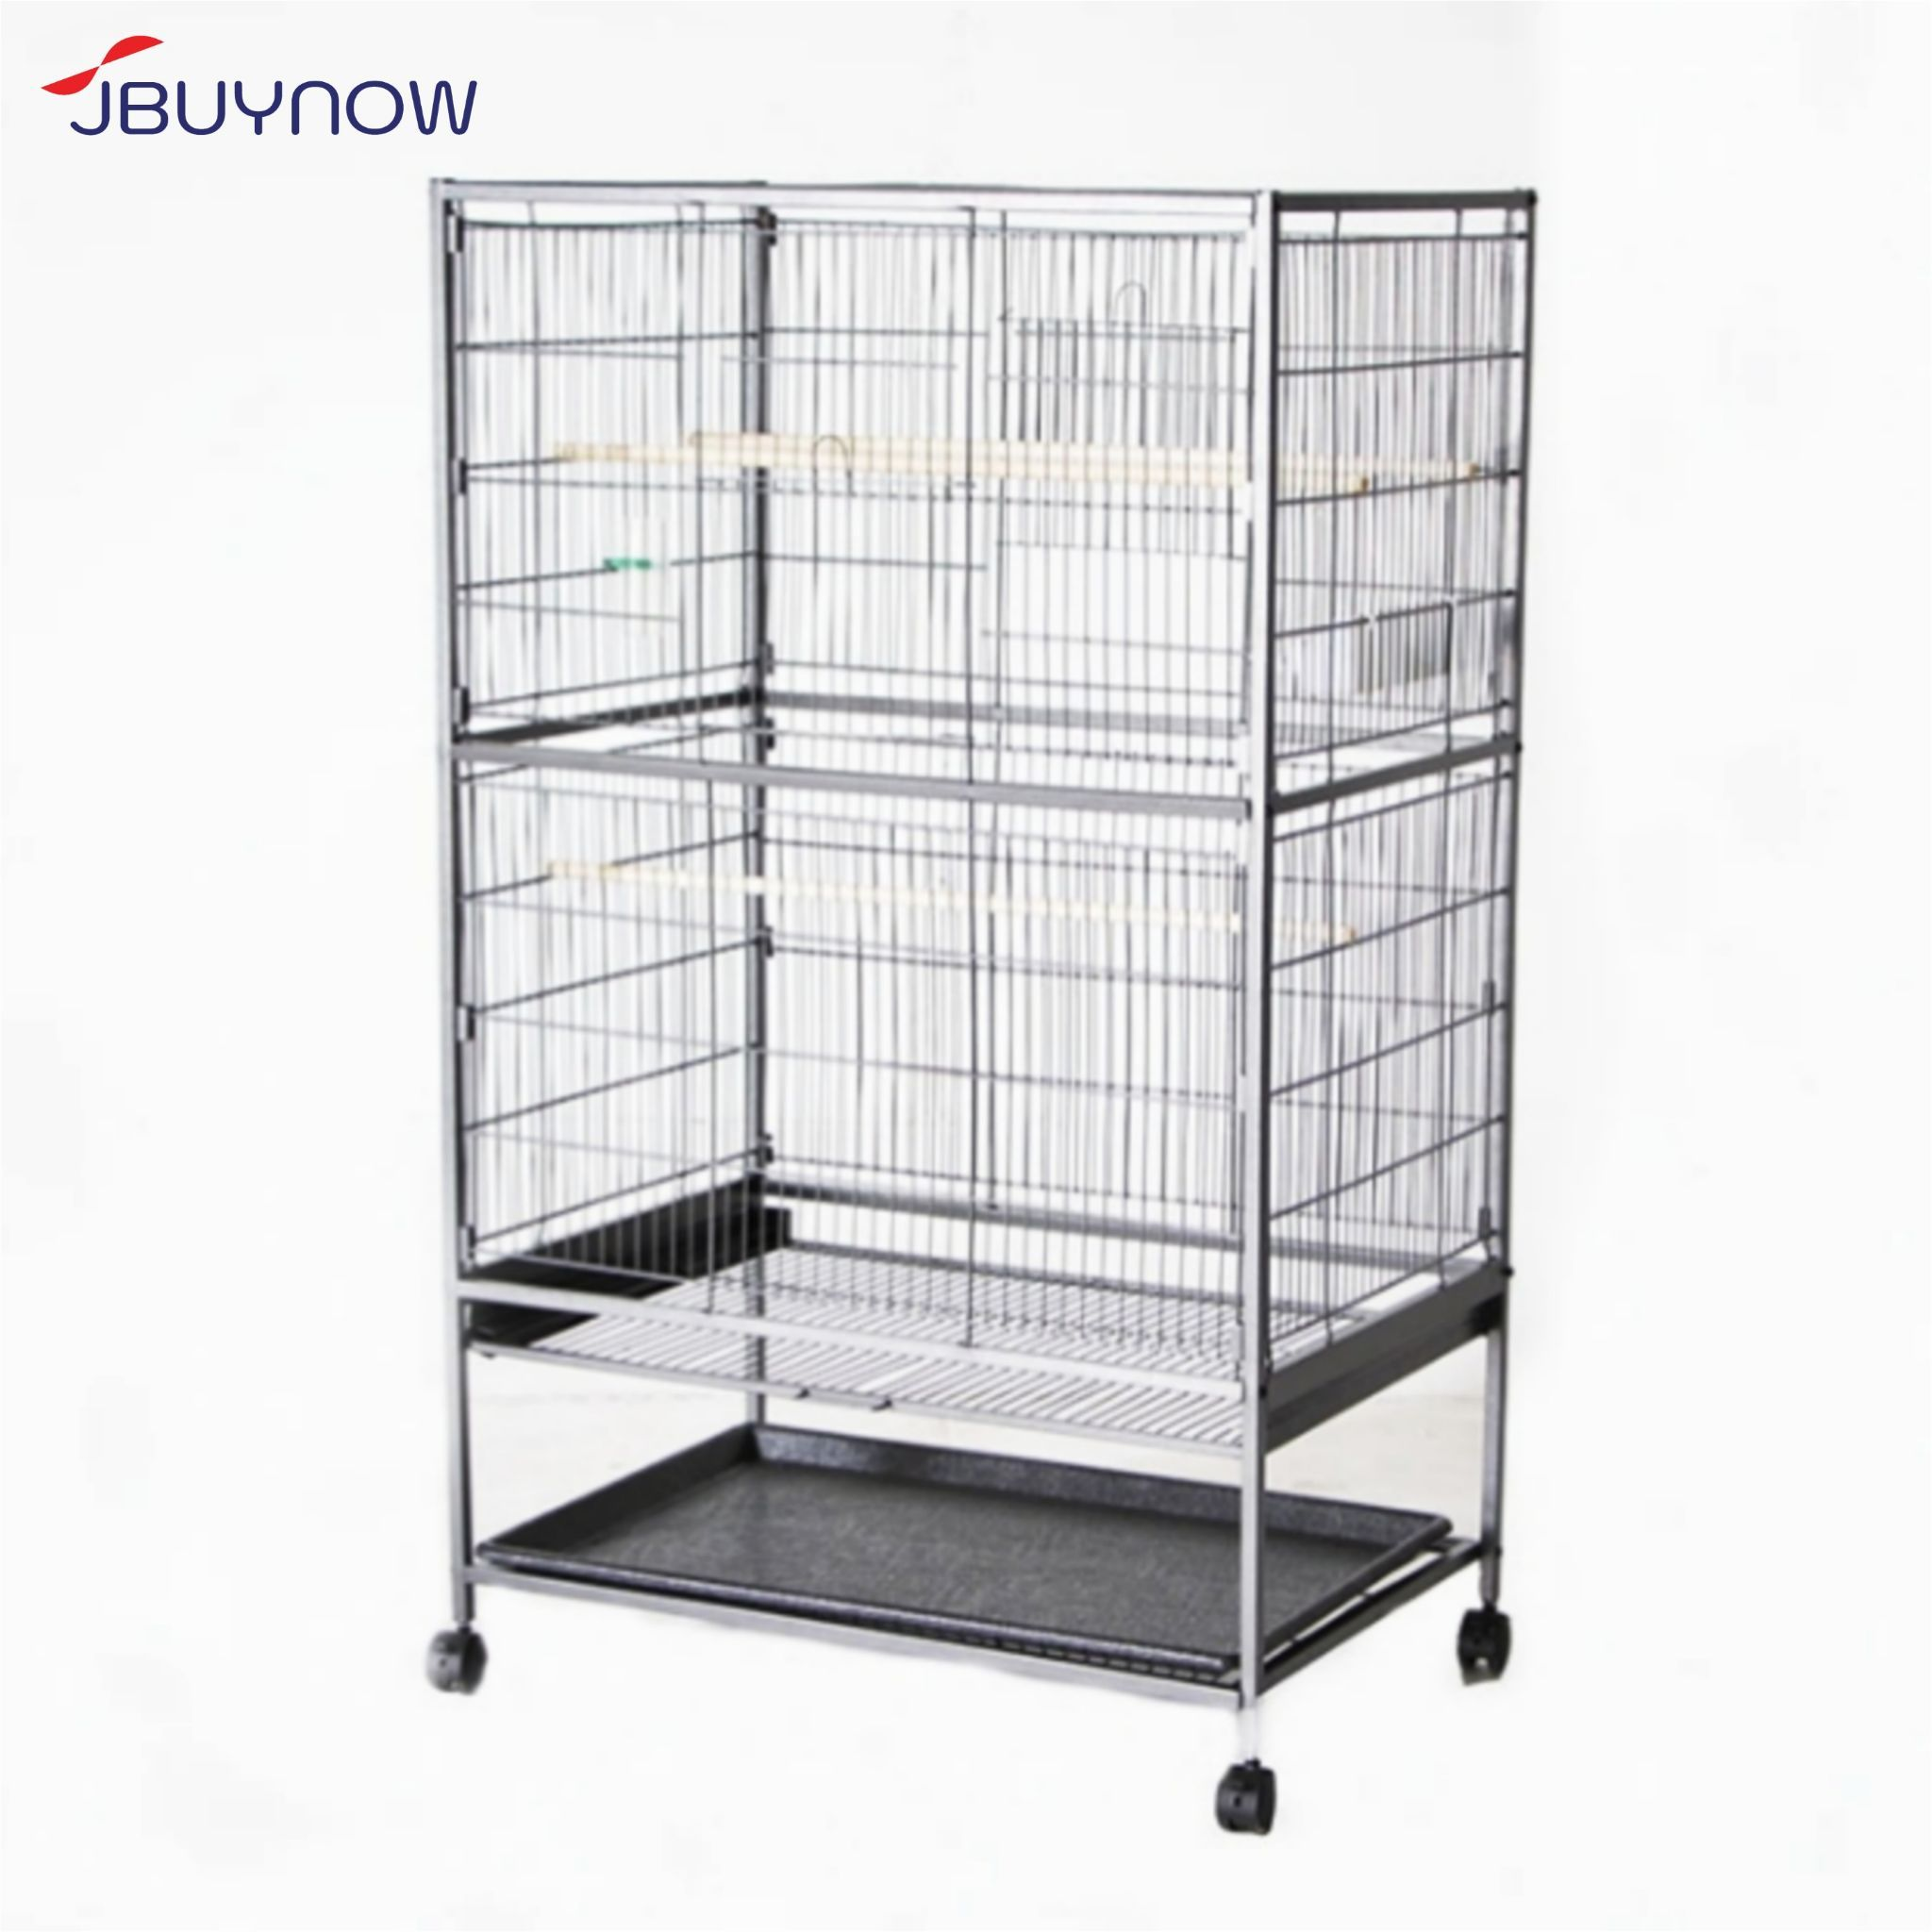 Bird Cage with Wheels กรงนกเหล็กมีล้อ เคลื่อนที่ได้ 78x52x131cm CT-006